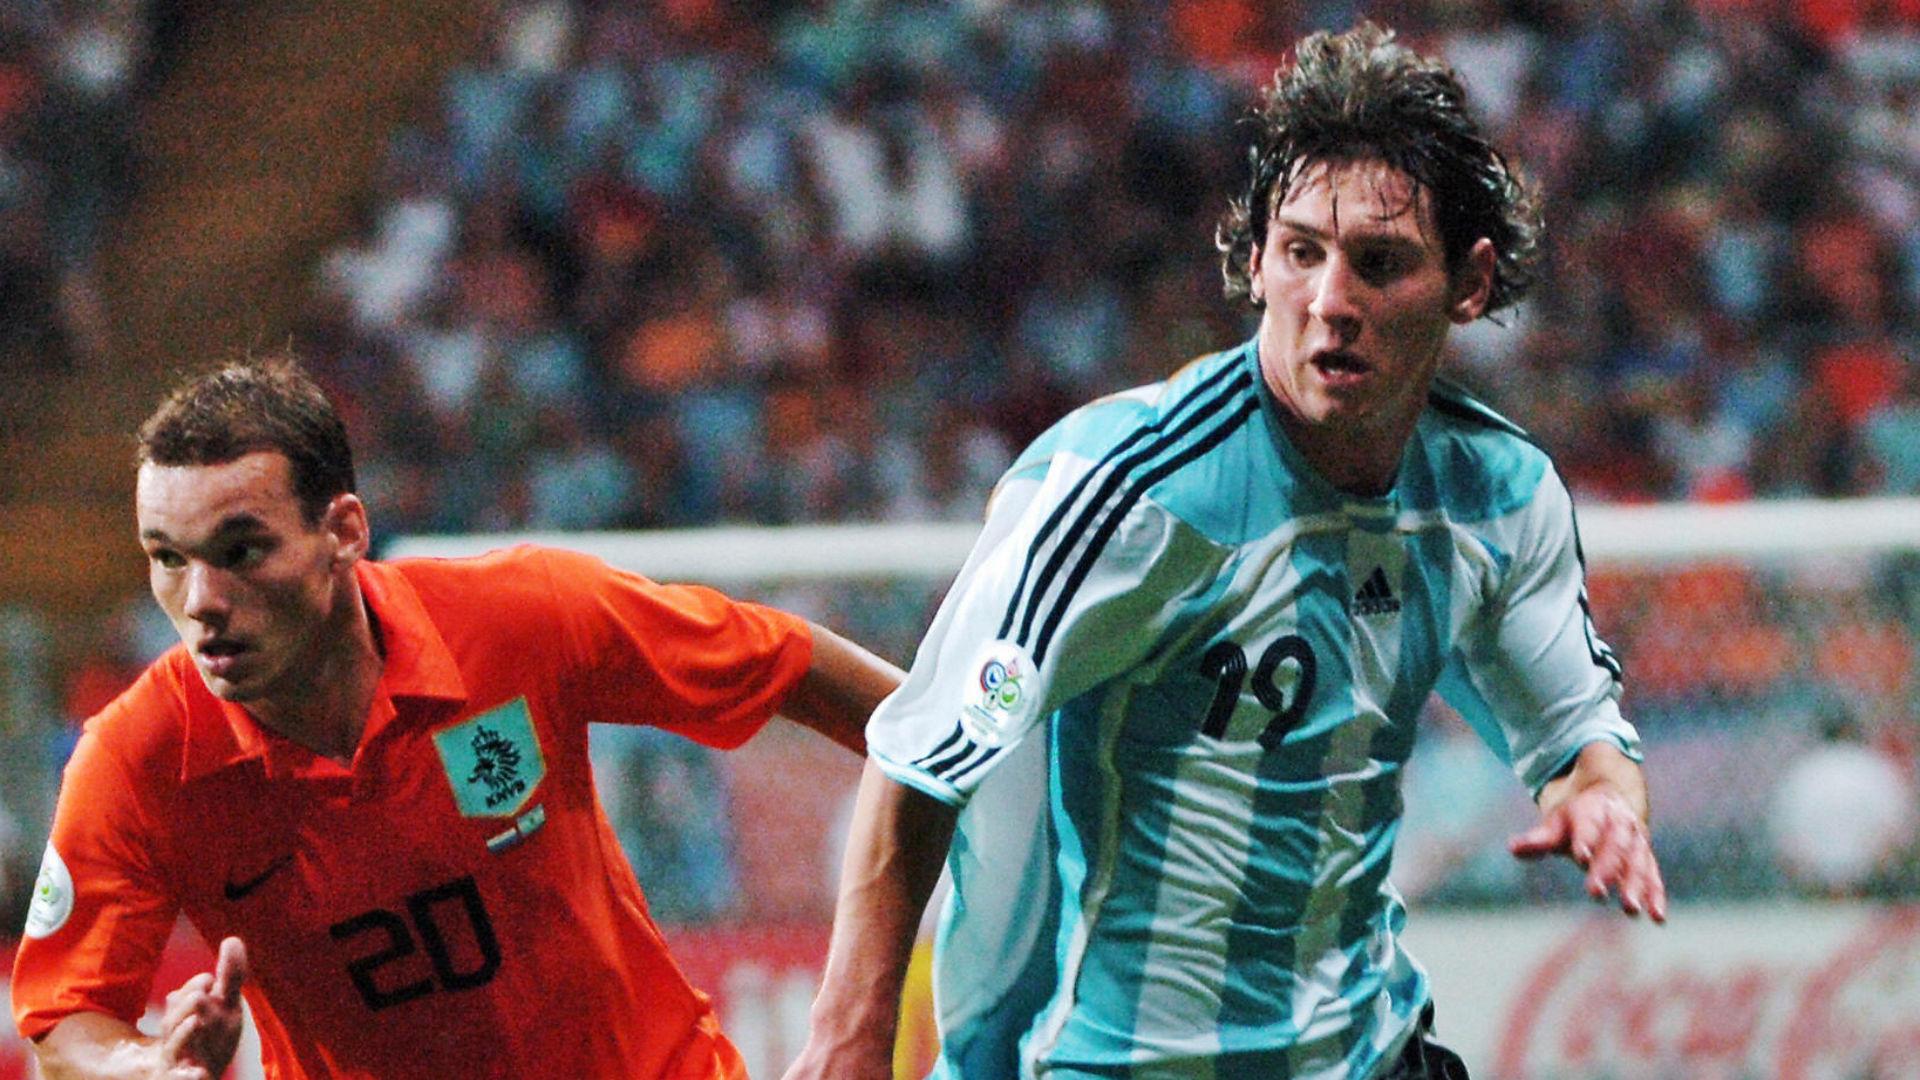 Wesley Sneijder Lionel Messi Netherlands Argentina World Cup 2006